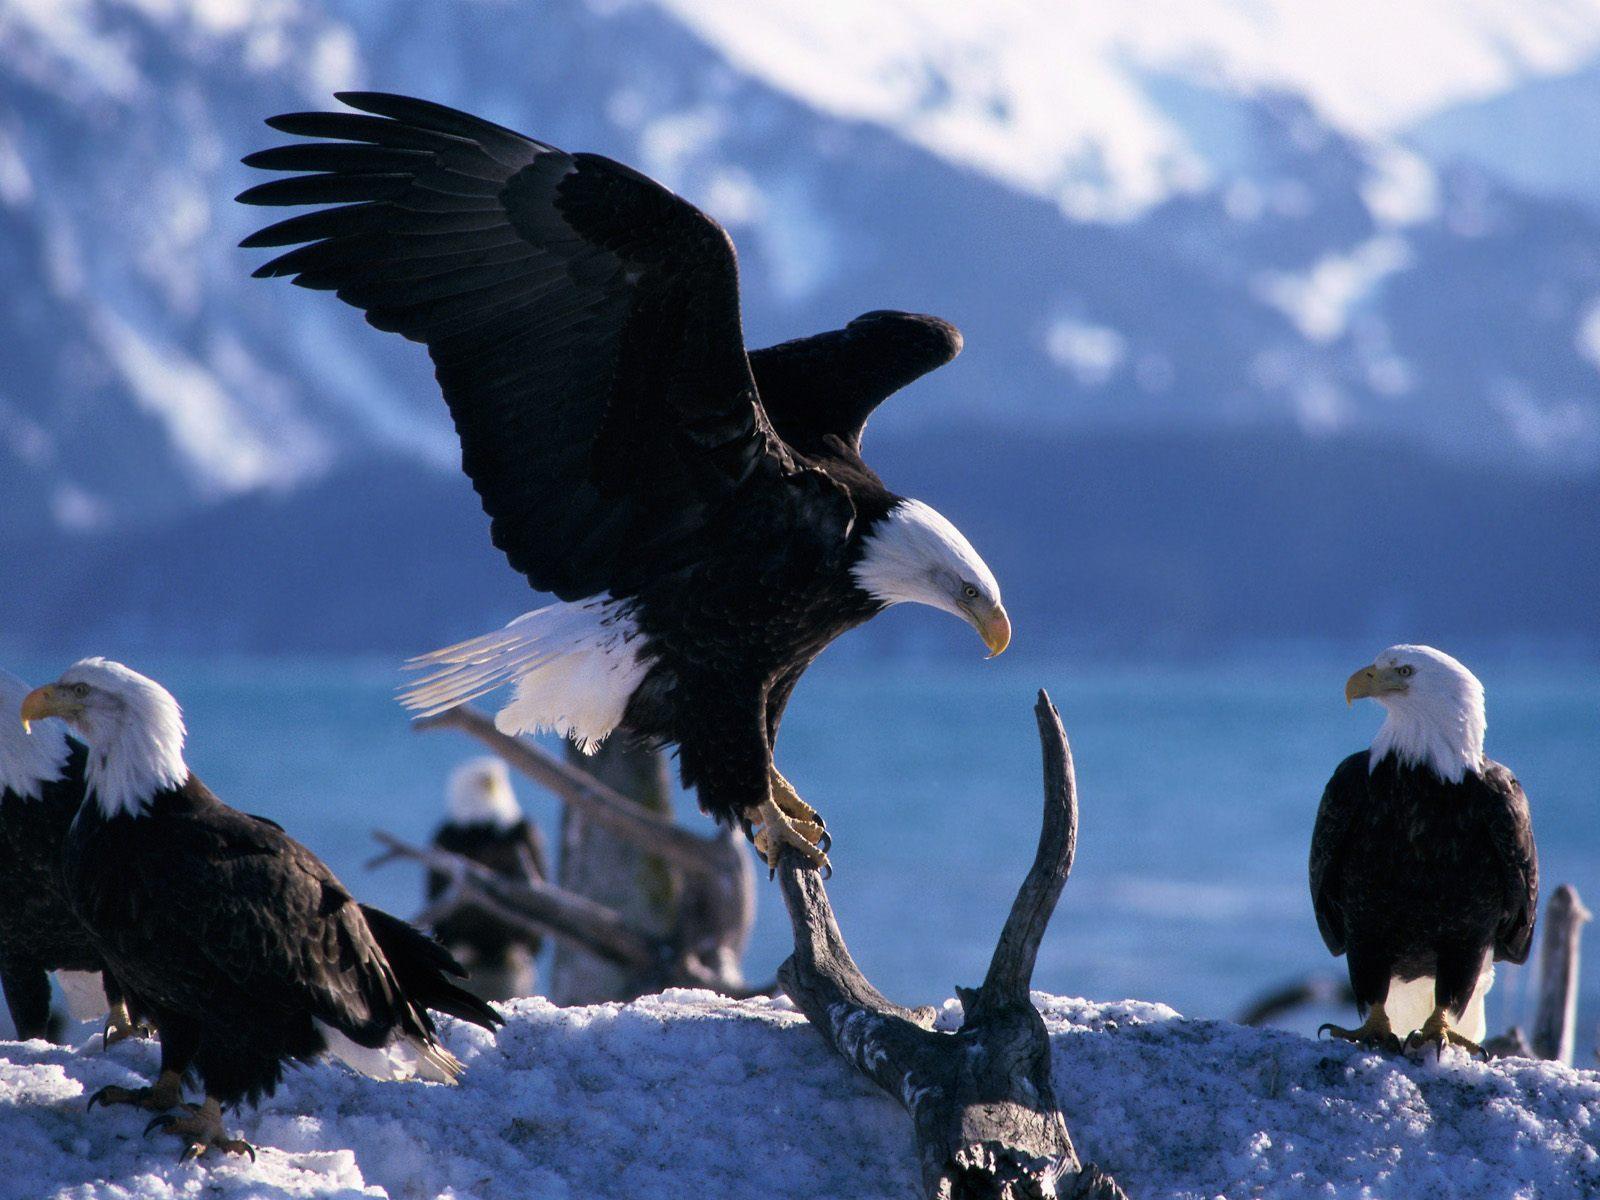 Must see   Wallpaper Horse Eagle - Eagle+Hawk+wallpapers+1  Photograph_18522.jpg